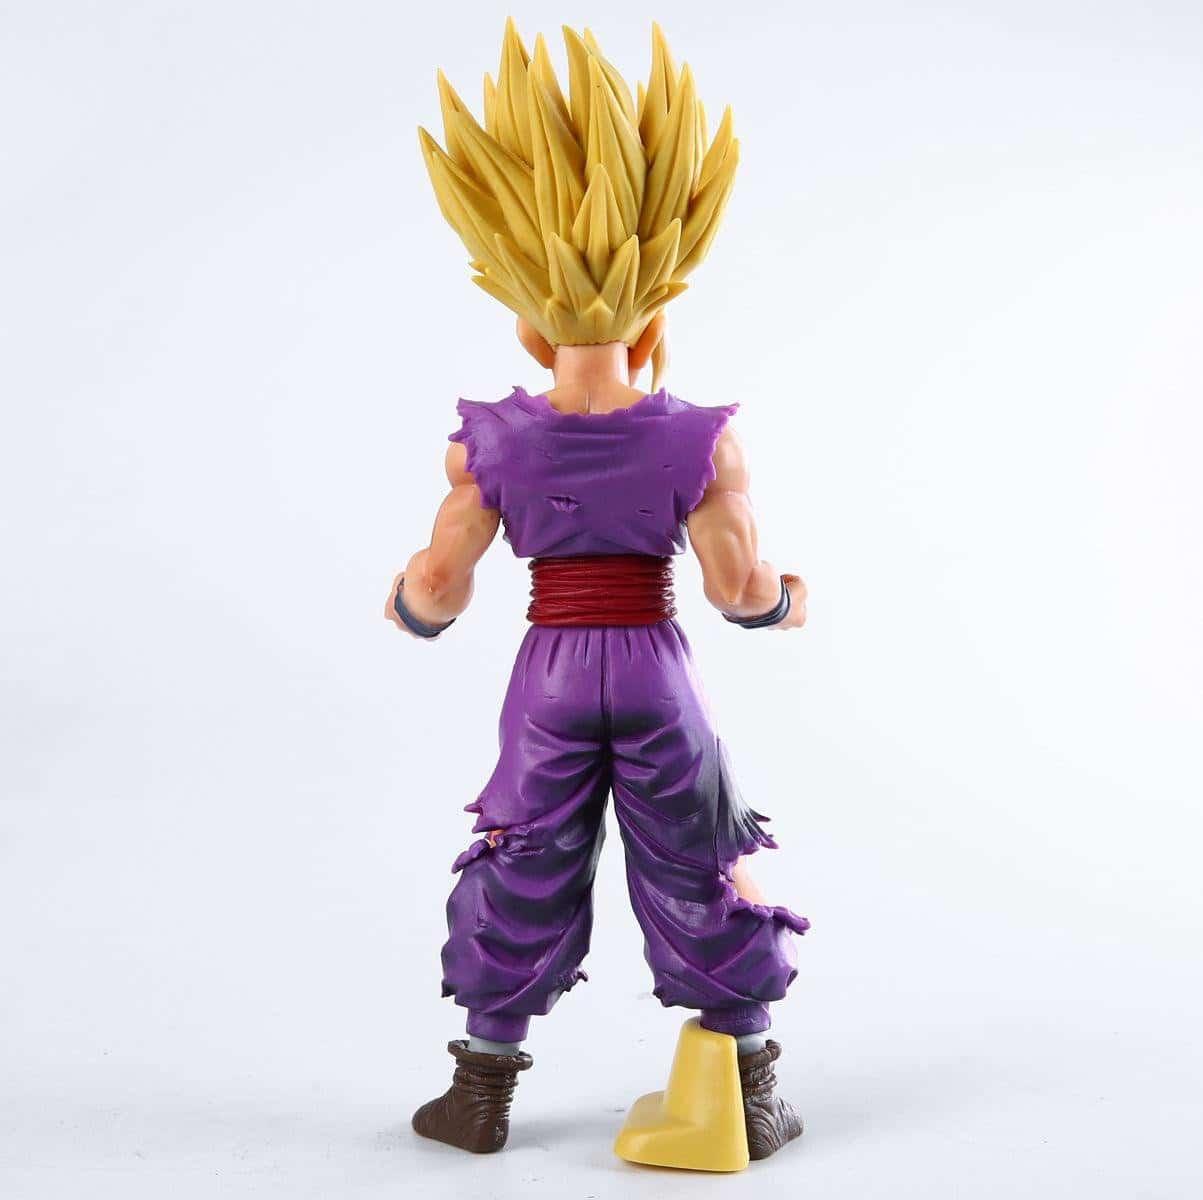 Dragon Ball Z Son Gohan Super Saiyan Figures 25cm - ghibli.store